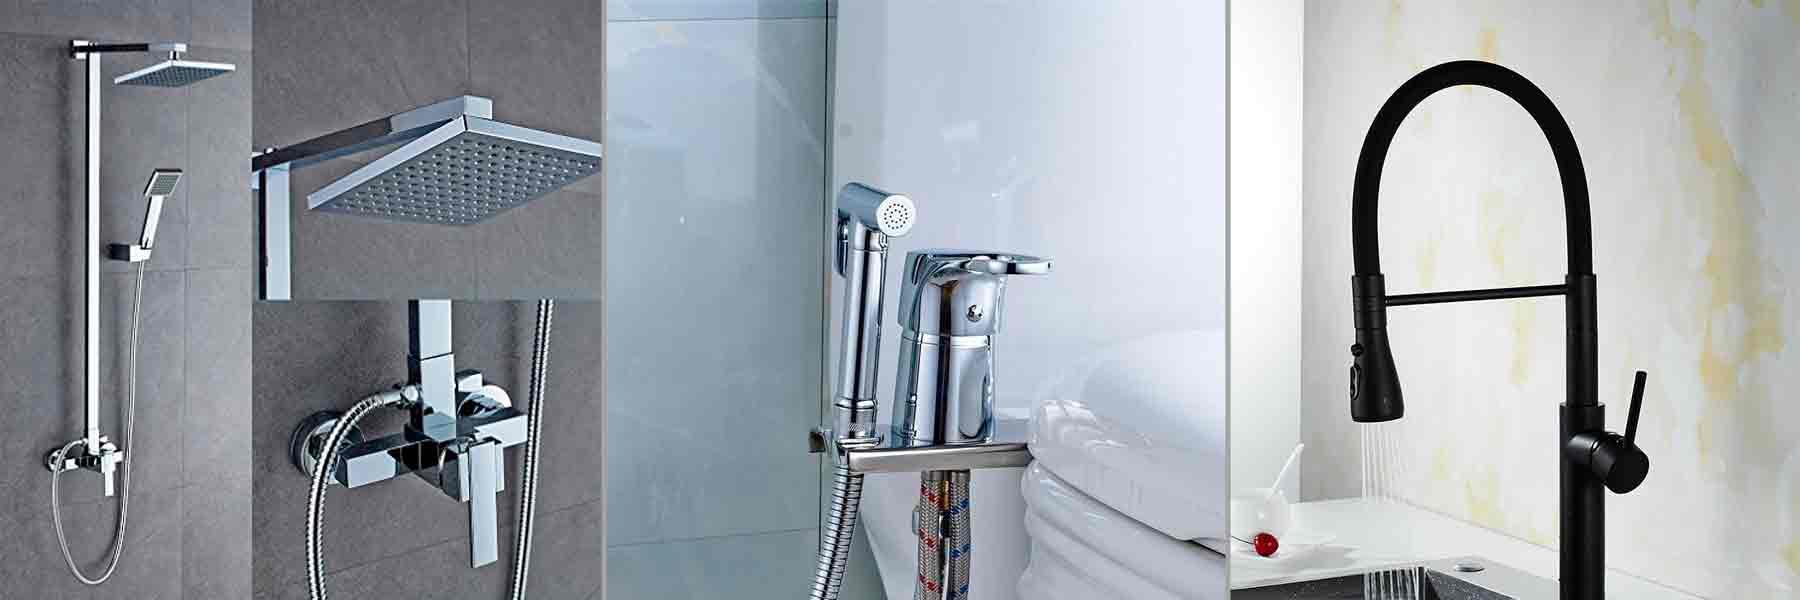 Фото кранов для ванны, кухни, душа, биде.